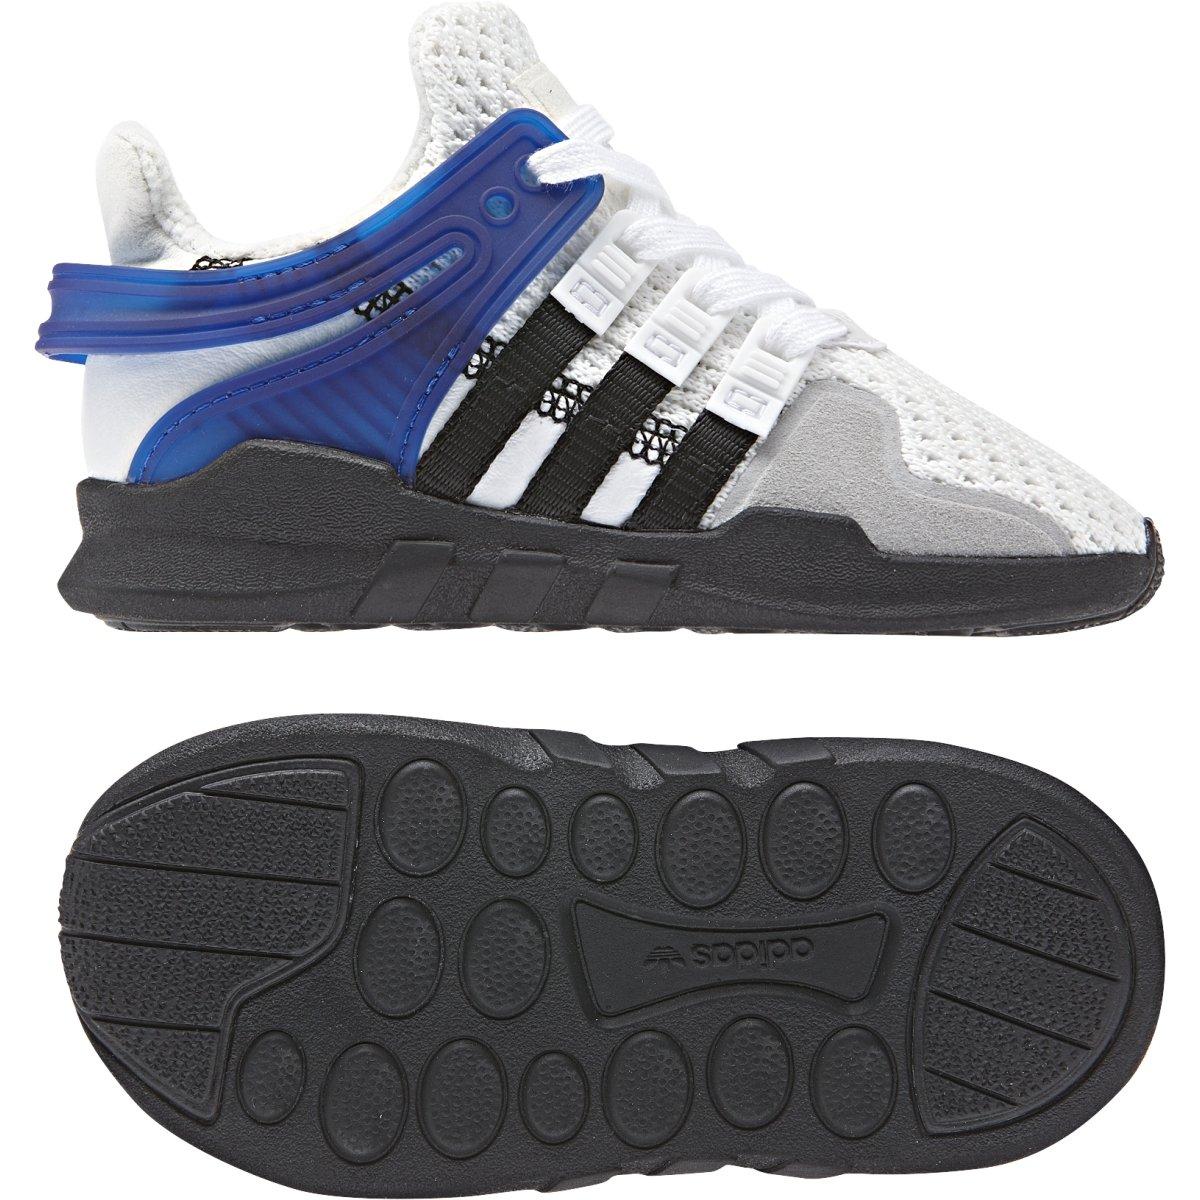 adidas Originals Kids Baby Boy's EQT Support ADV (Toddler) White/Black 6.5 M US Toddler by adidas Originals